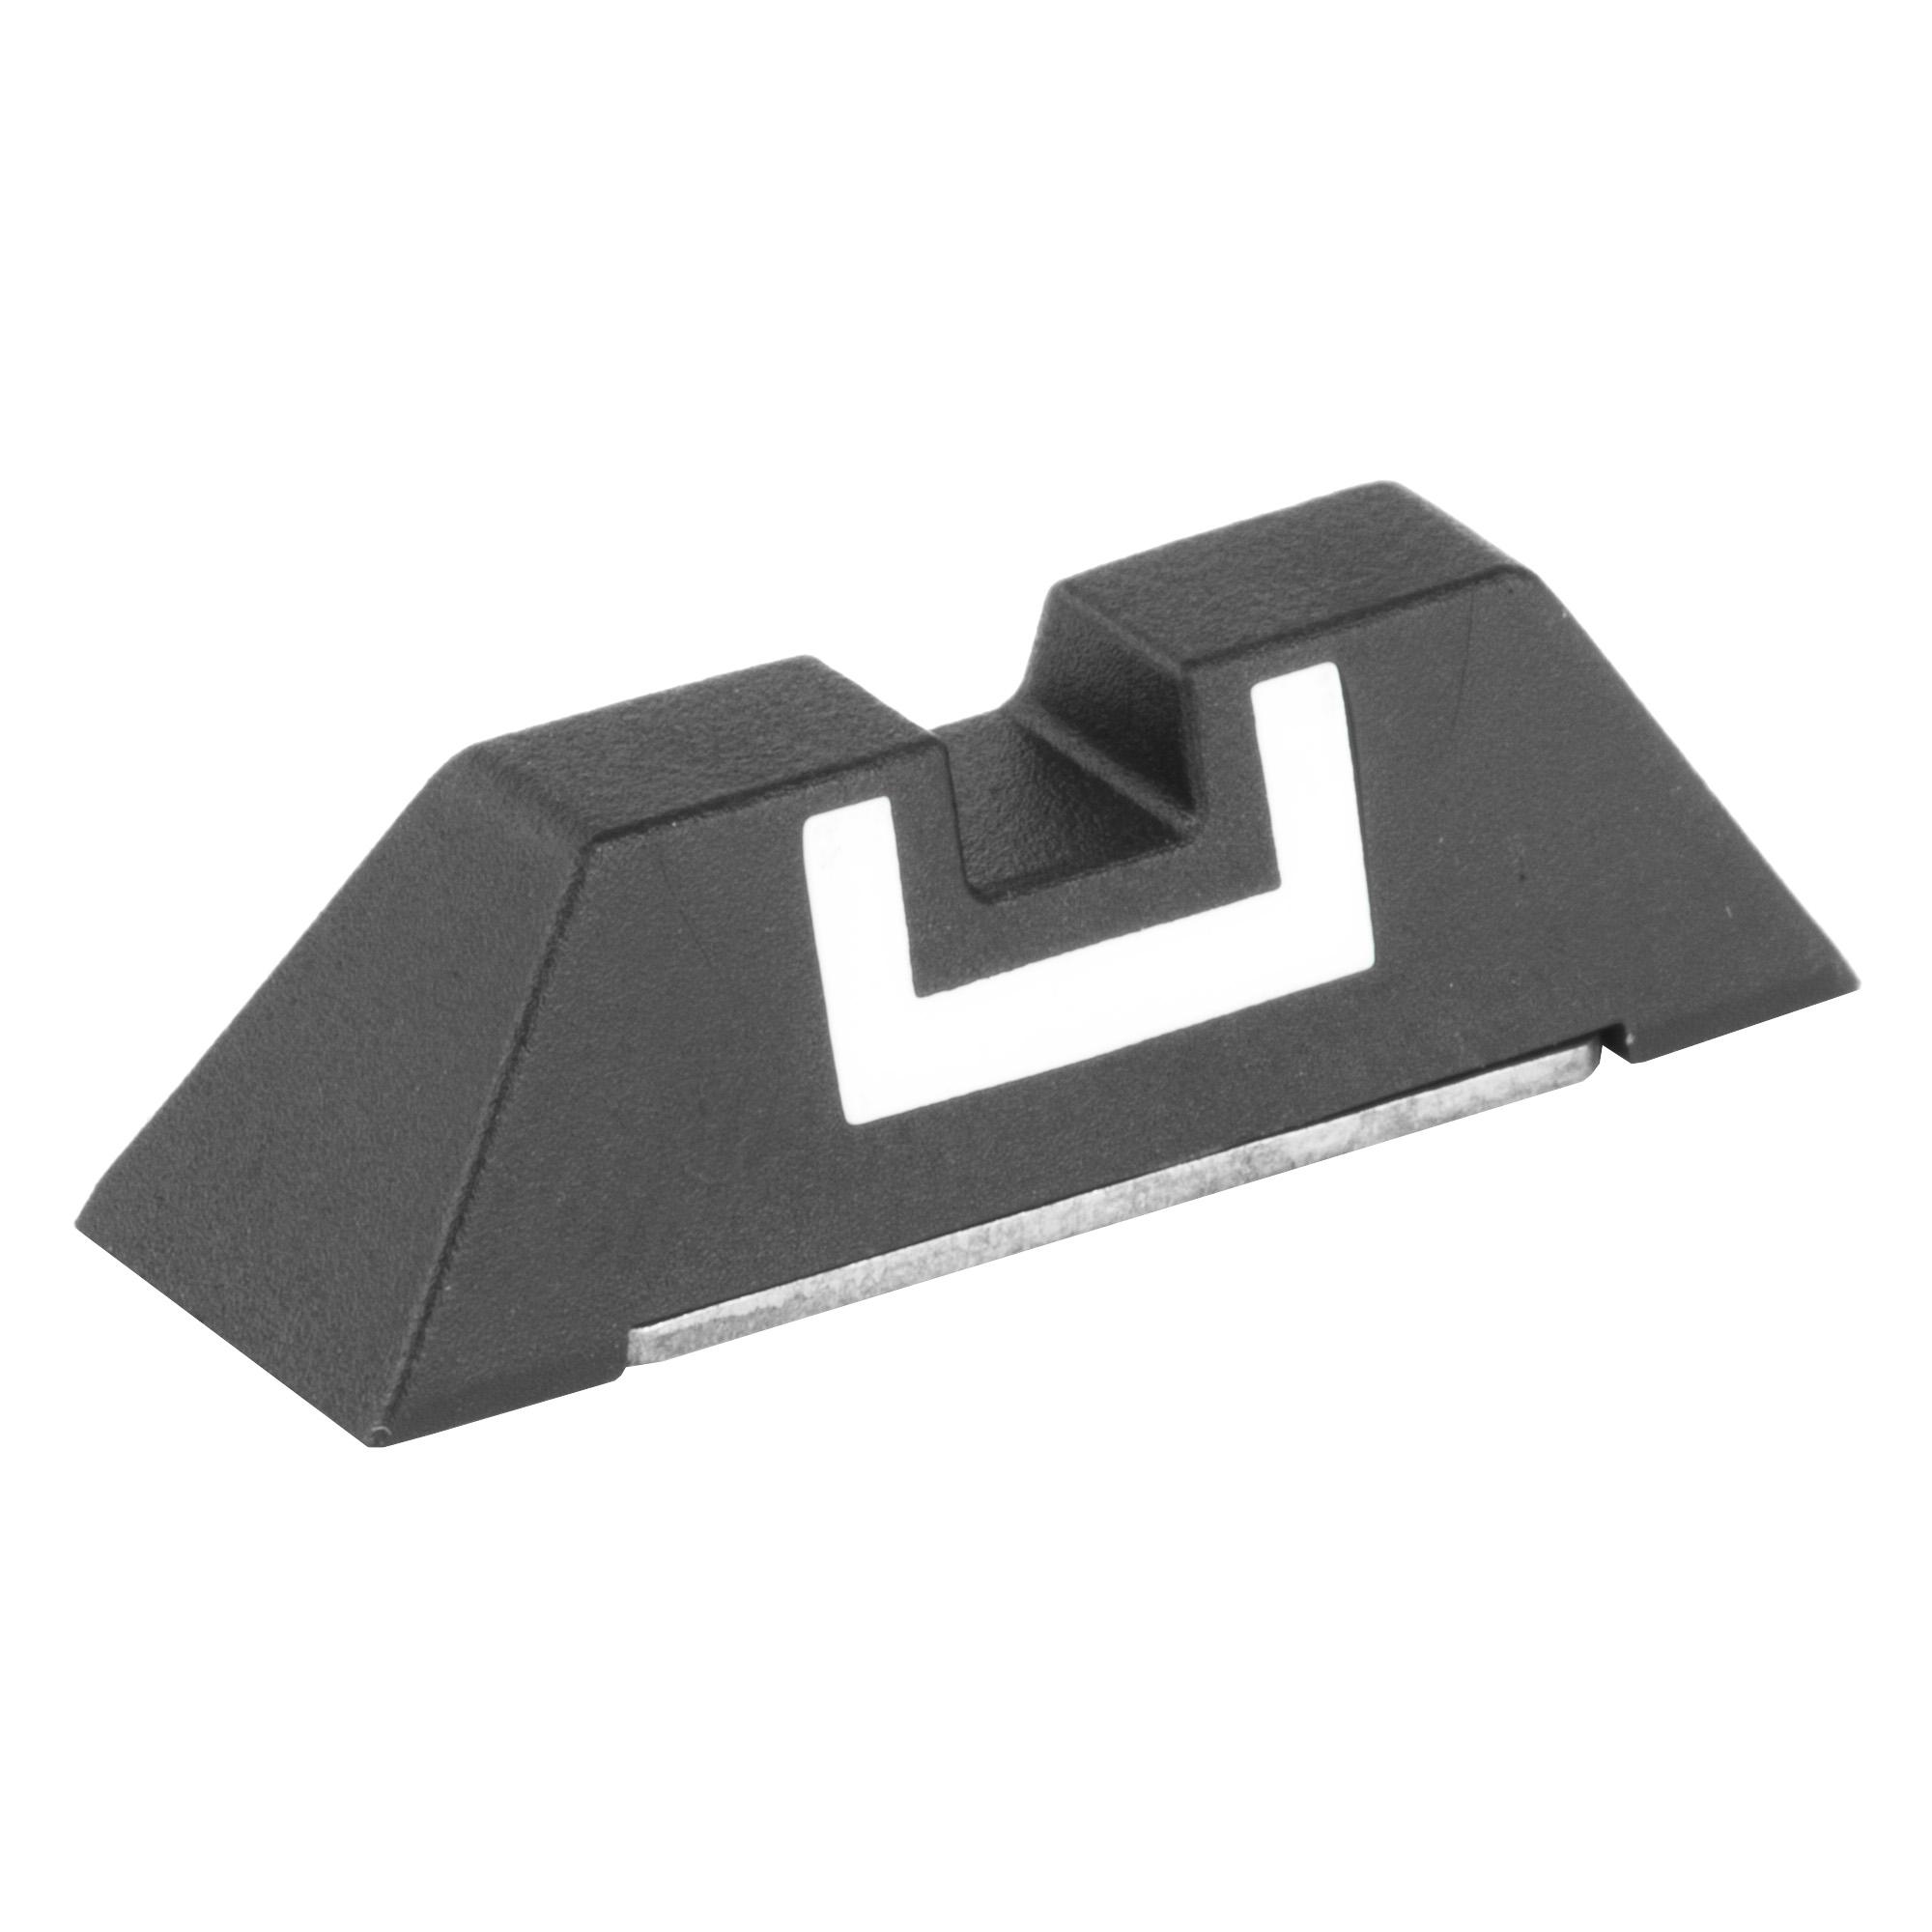 Glock Oem Fxd Rear Sight 6.5mm Poly